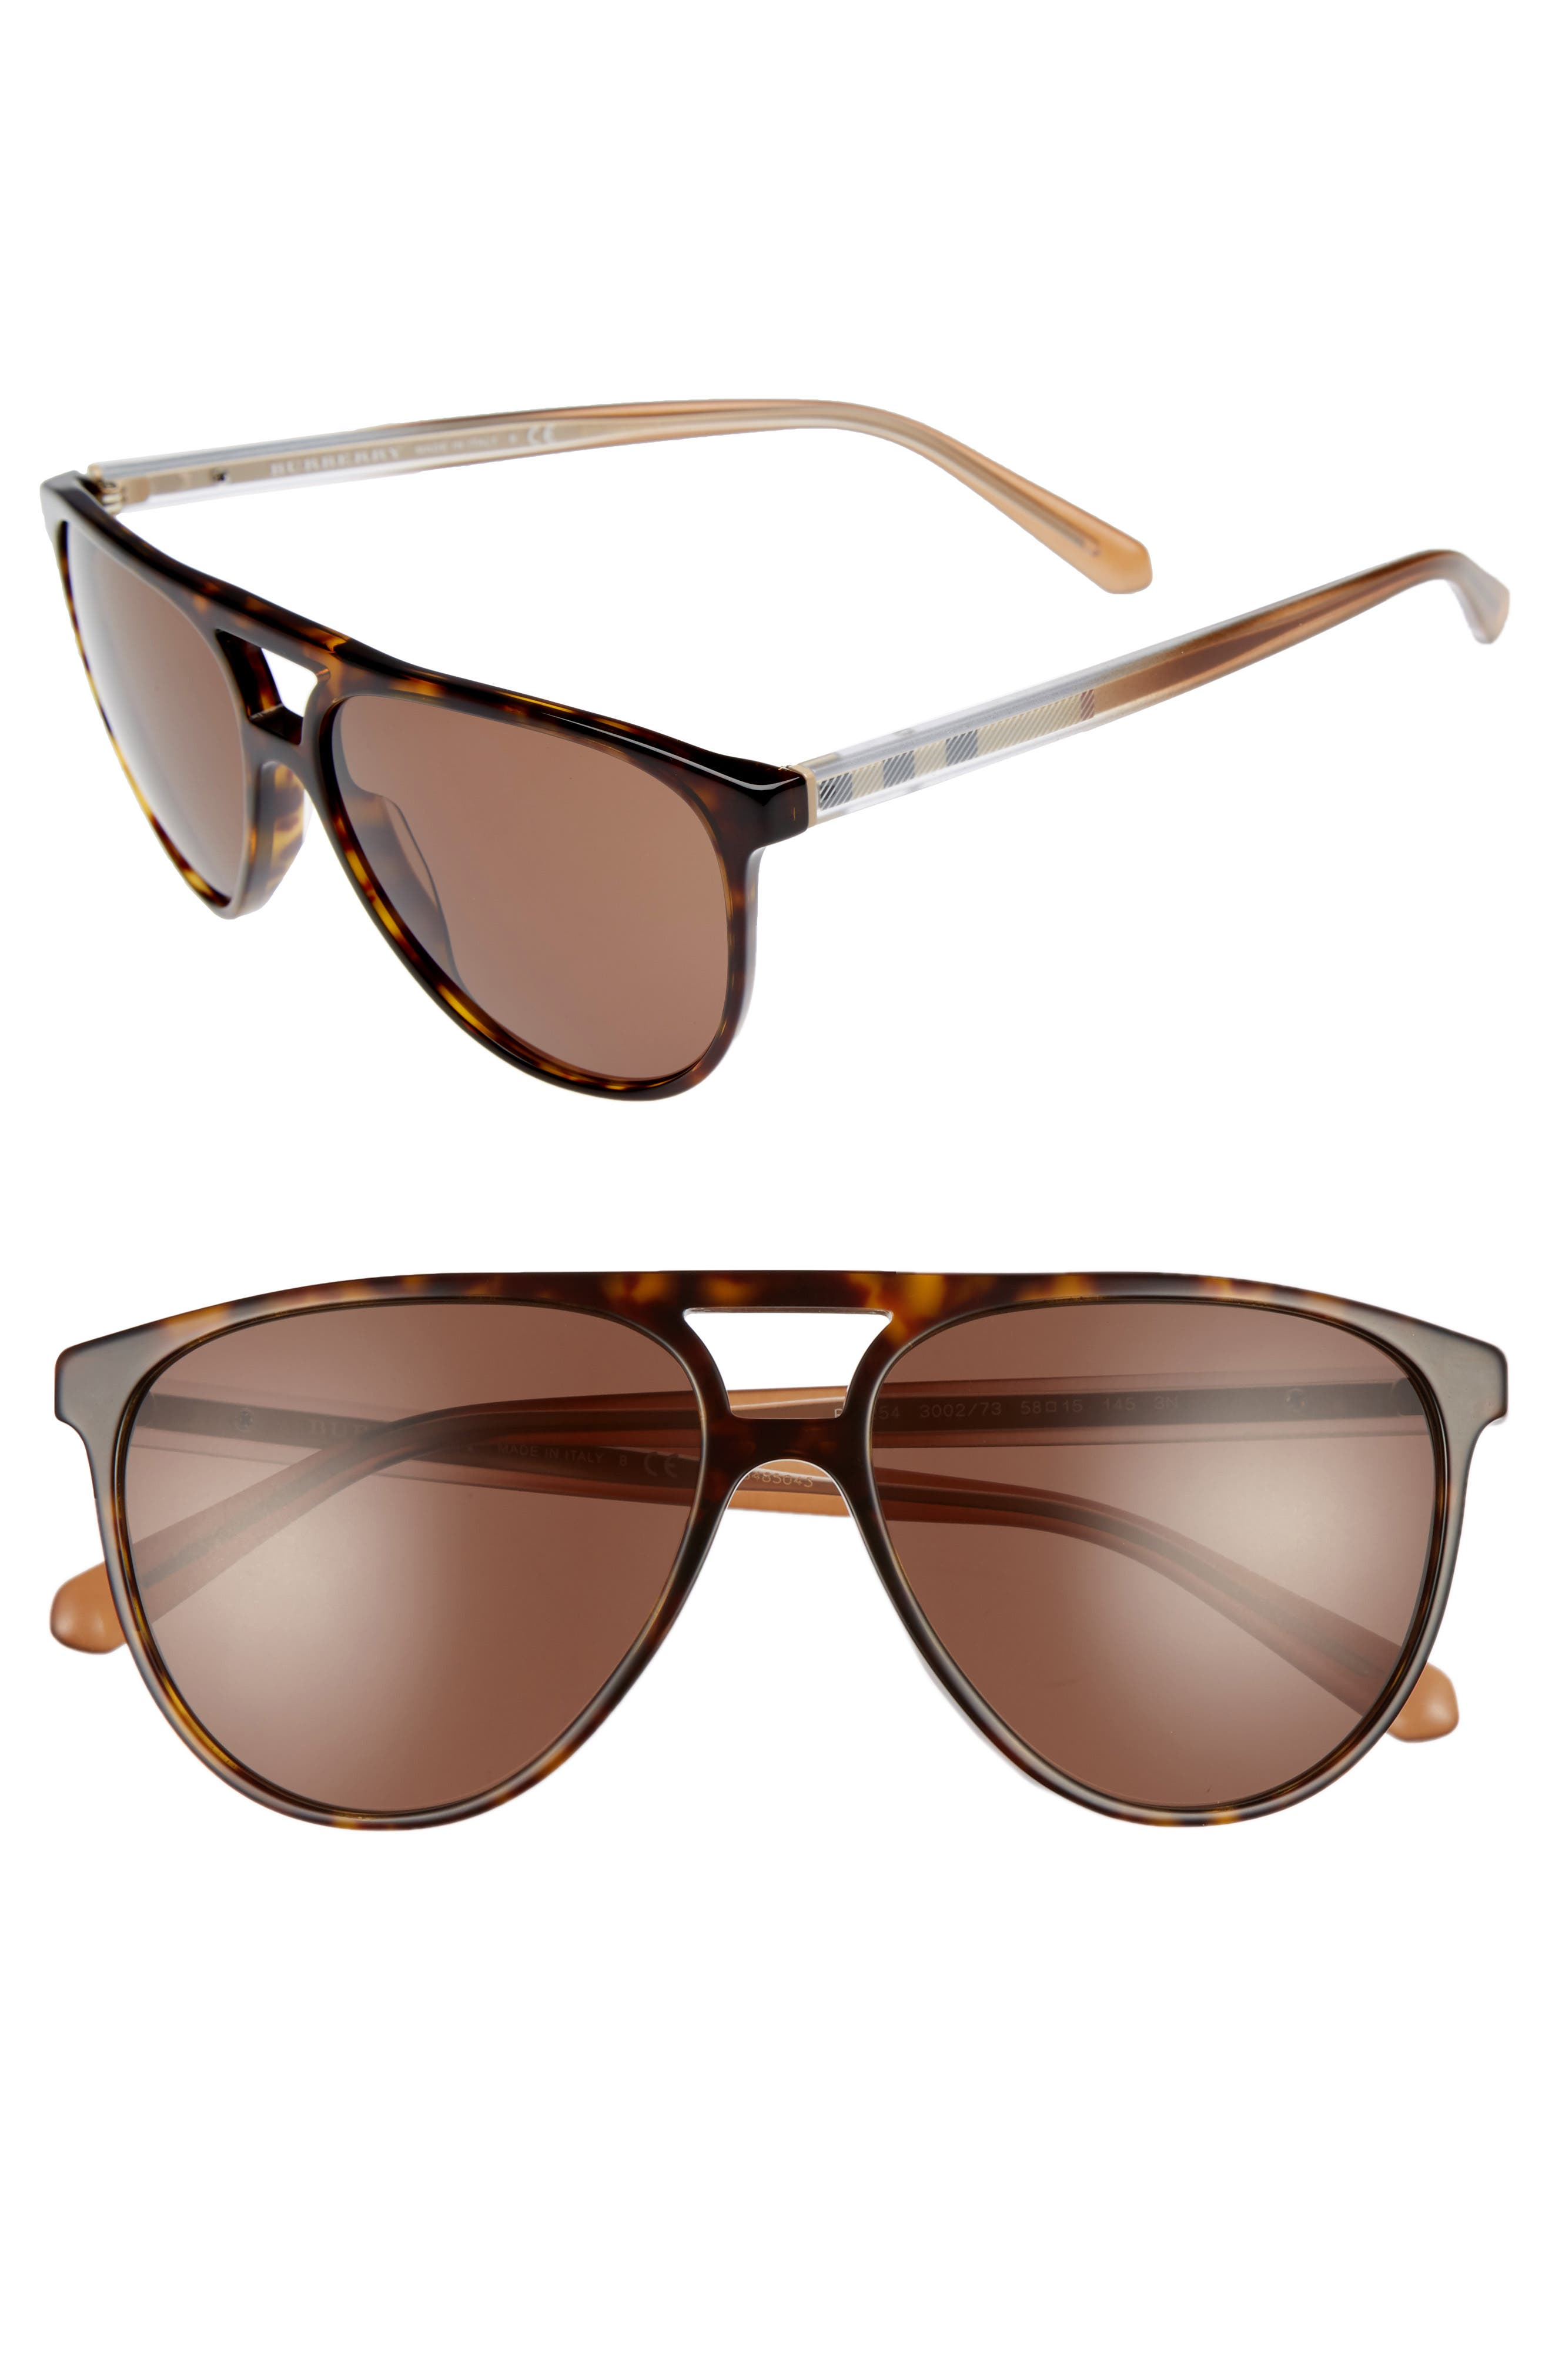 Main Image - Burberry 58mm Aviator Sunglasses